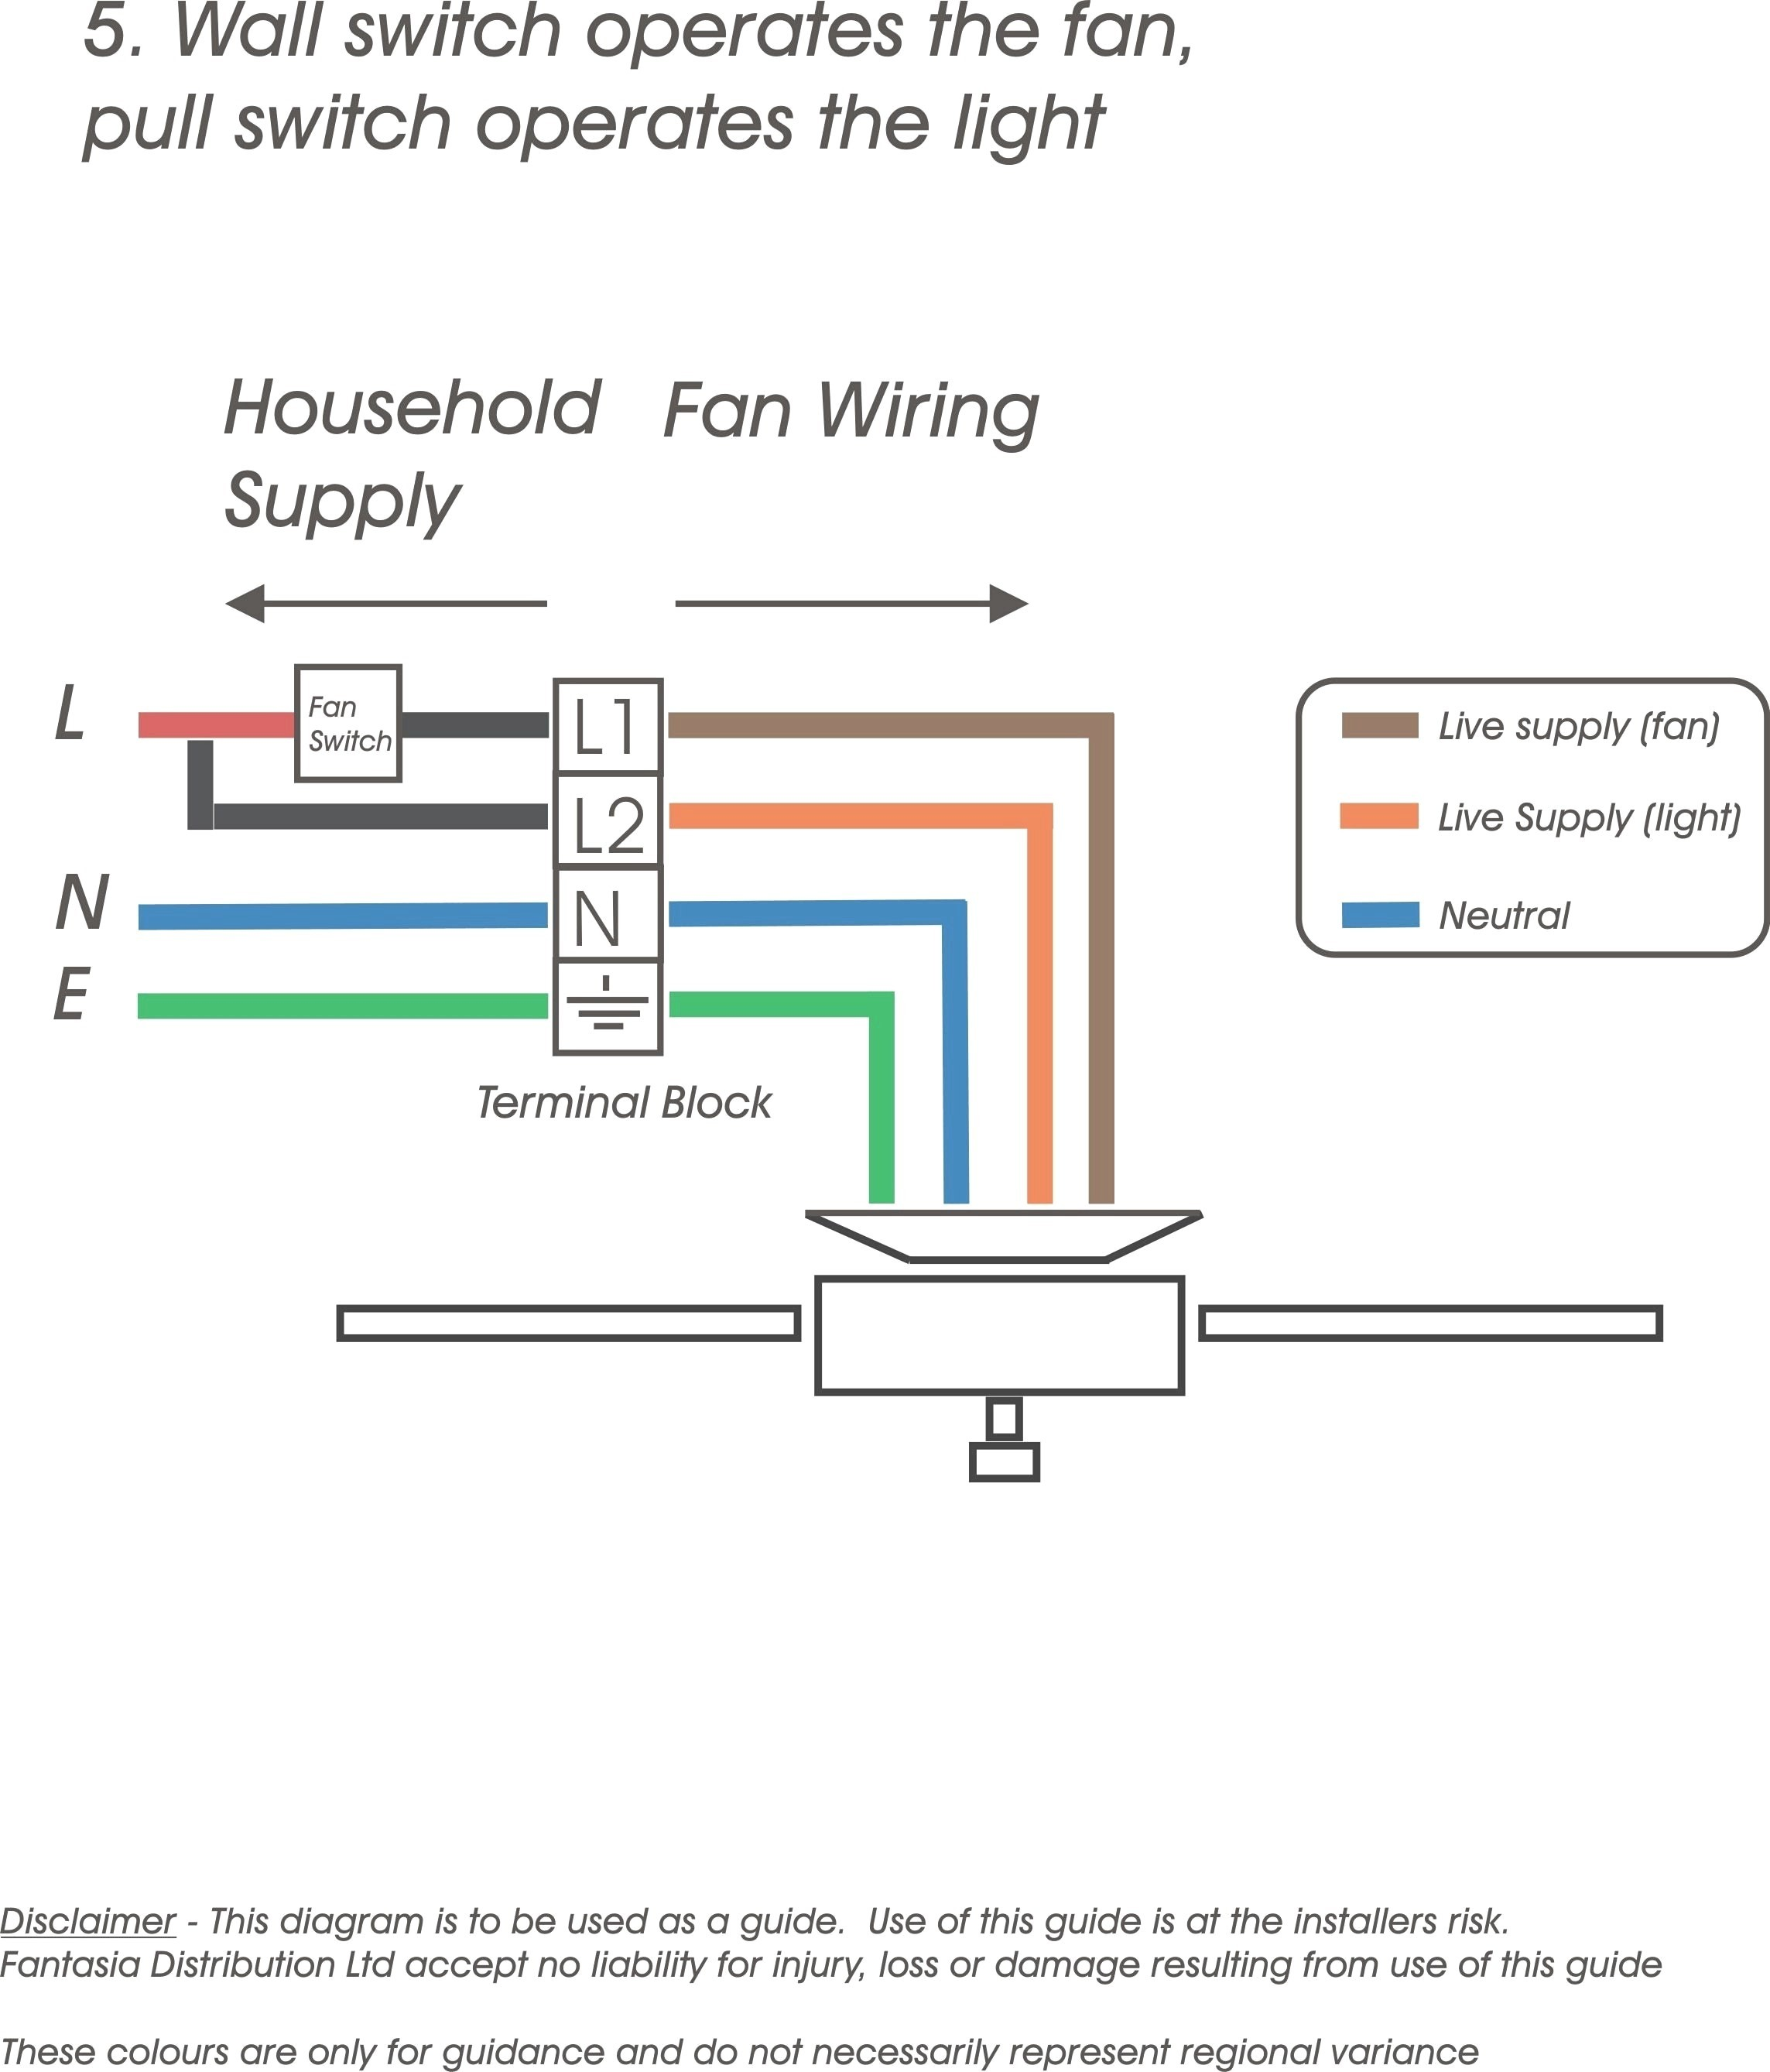 rotary switch wiring diagram dimarzio manual e books 3497644 Switch Wiring Diagram dimarzio wiring diagram telecaster wiring library5 way switch wiring diagram new telecaster wiring diagram dimarzio copy